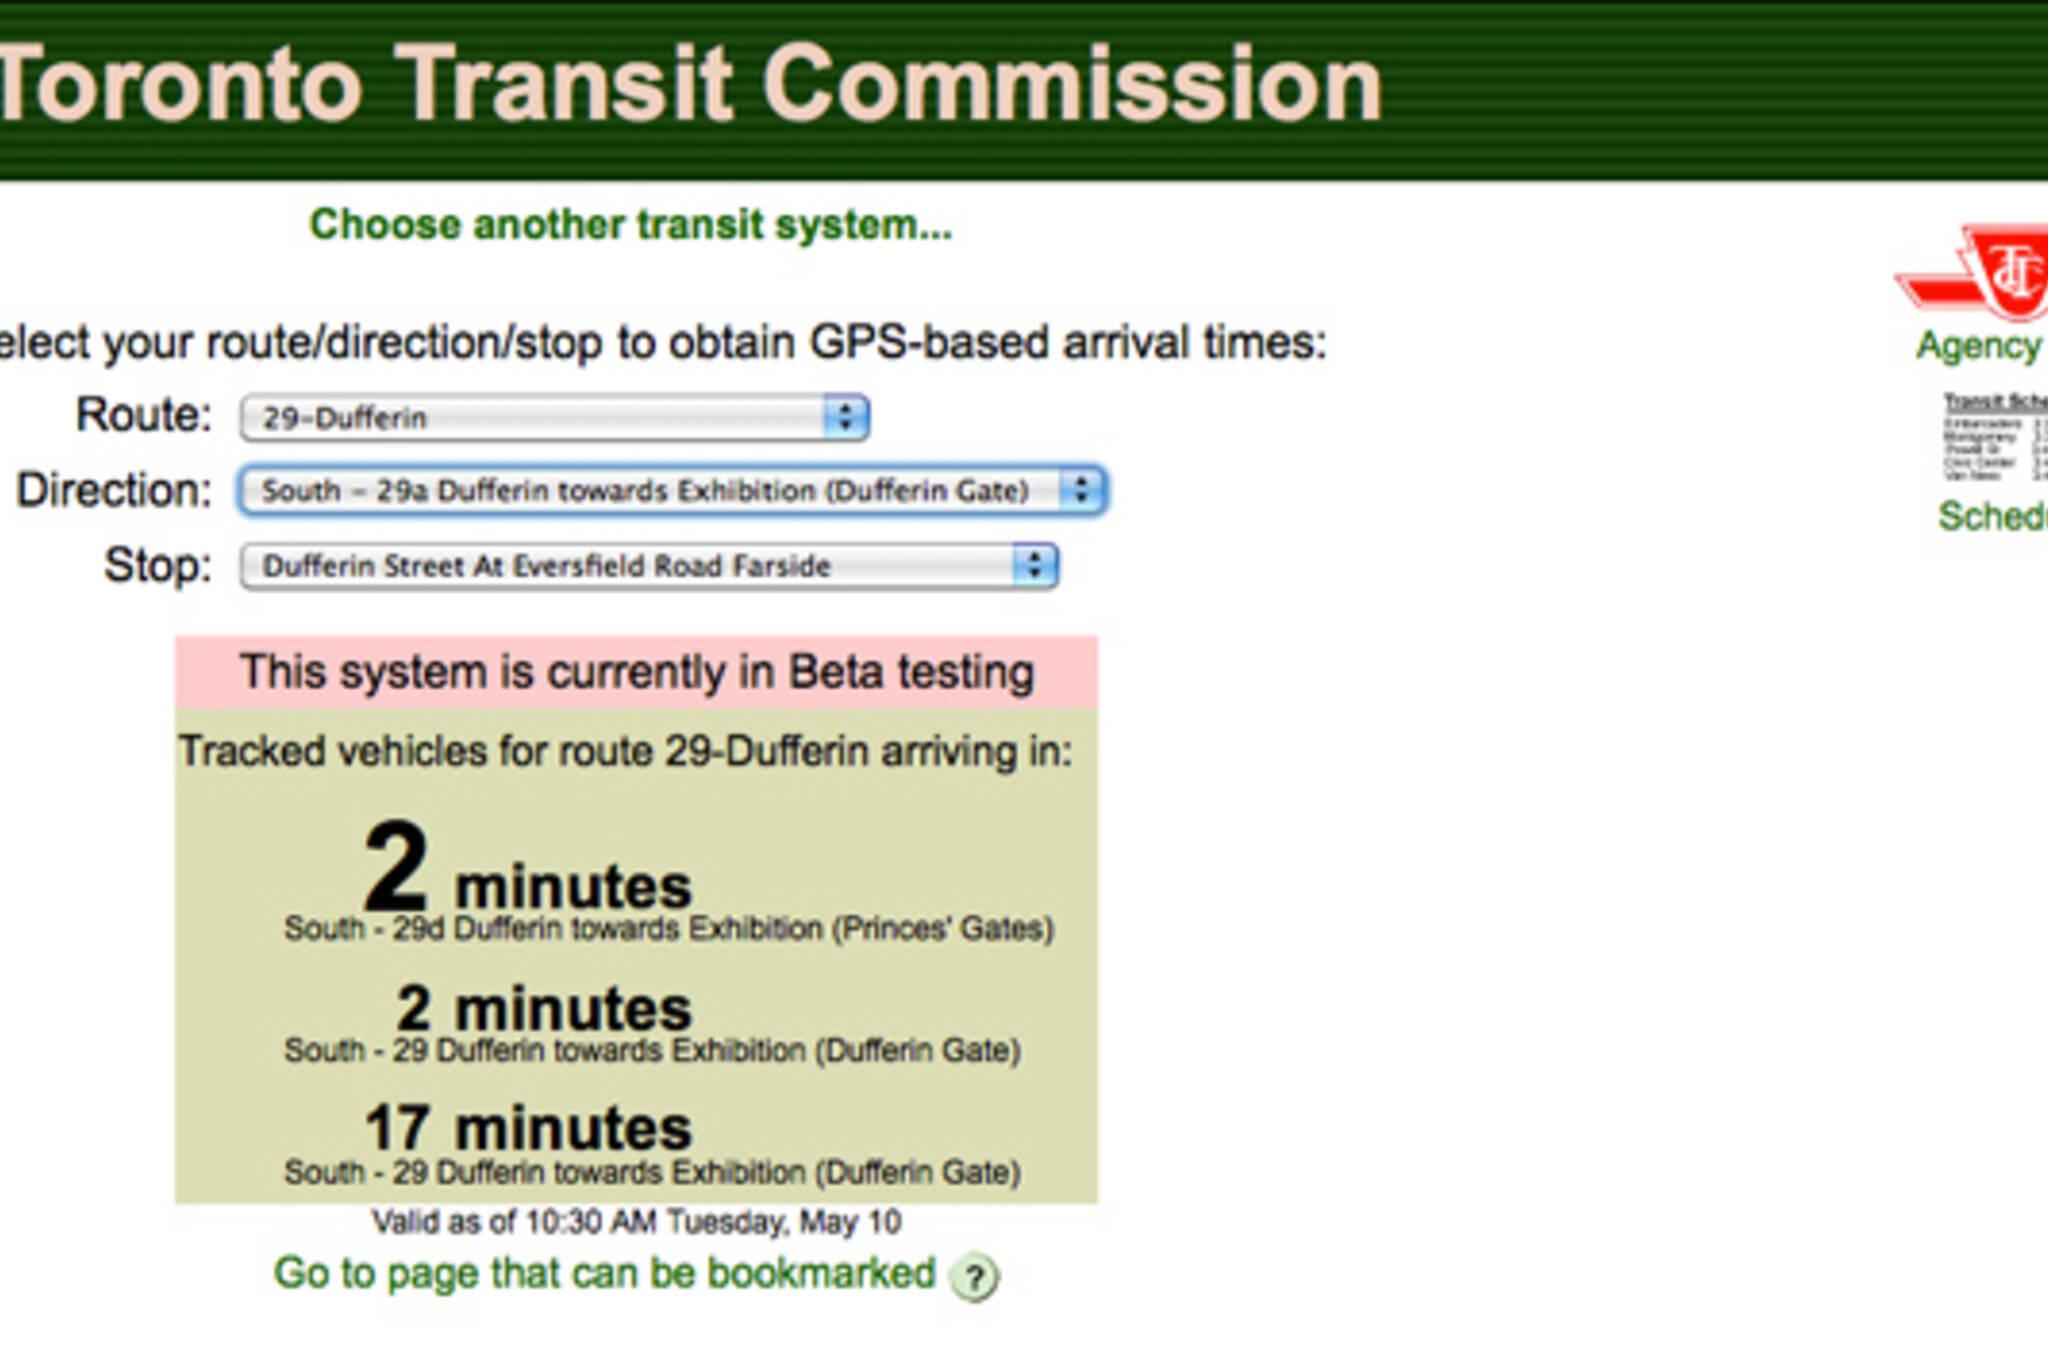 TTC Buses Next Vehicle Arrival Times